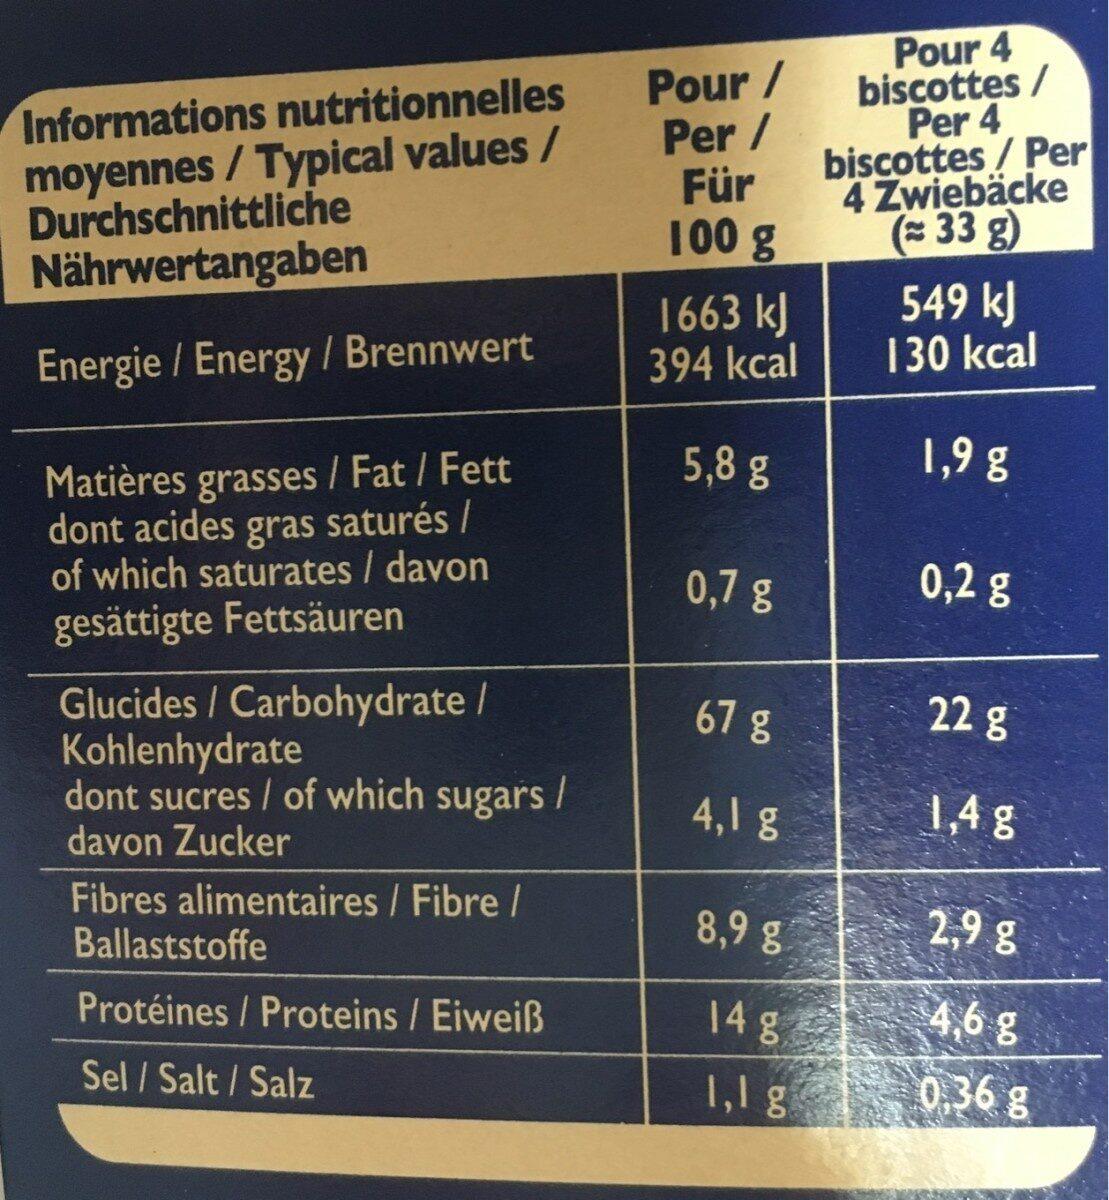 Biscottes Blé Complet 36tranches 300g - Informations nutritionnelles - fr